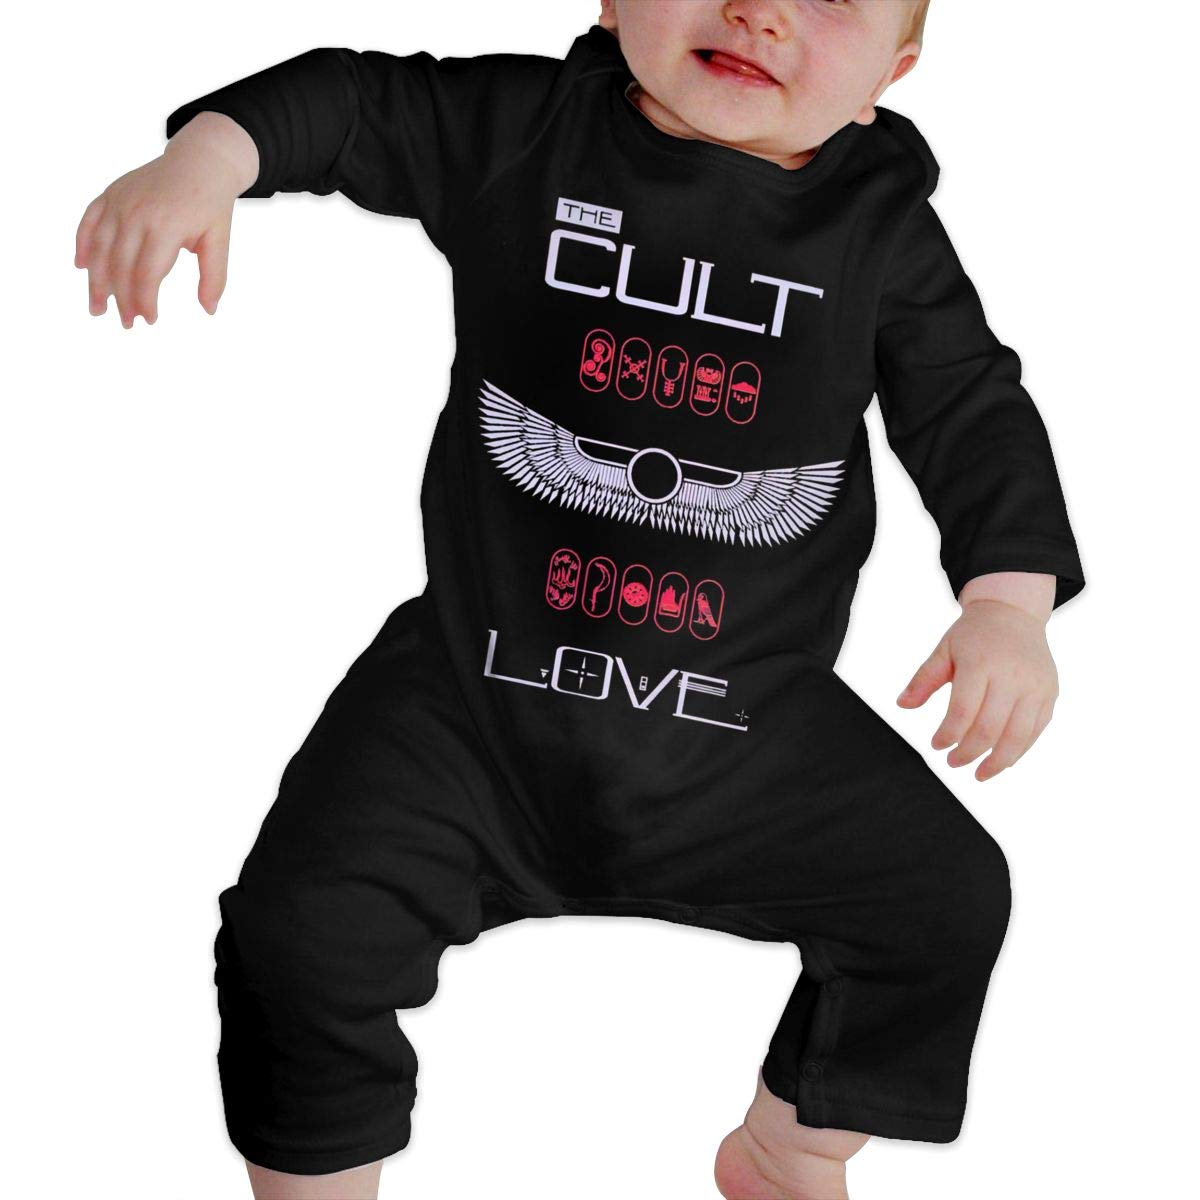 Gary Katte The Cu-lt L-ove Newborn Jumpsuit Infant Baby Girls Long-Sleeve Bodysuit Playsuit Outfits Clothes Black